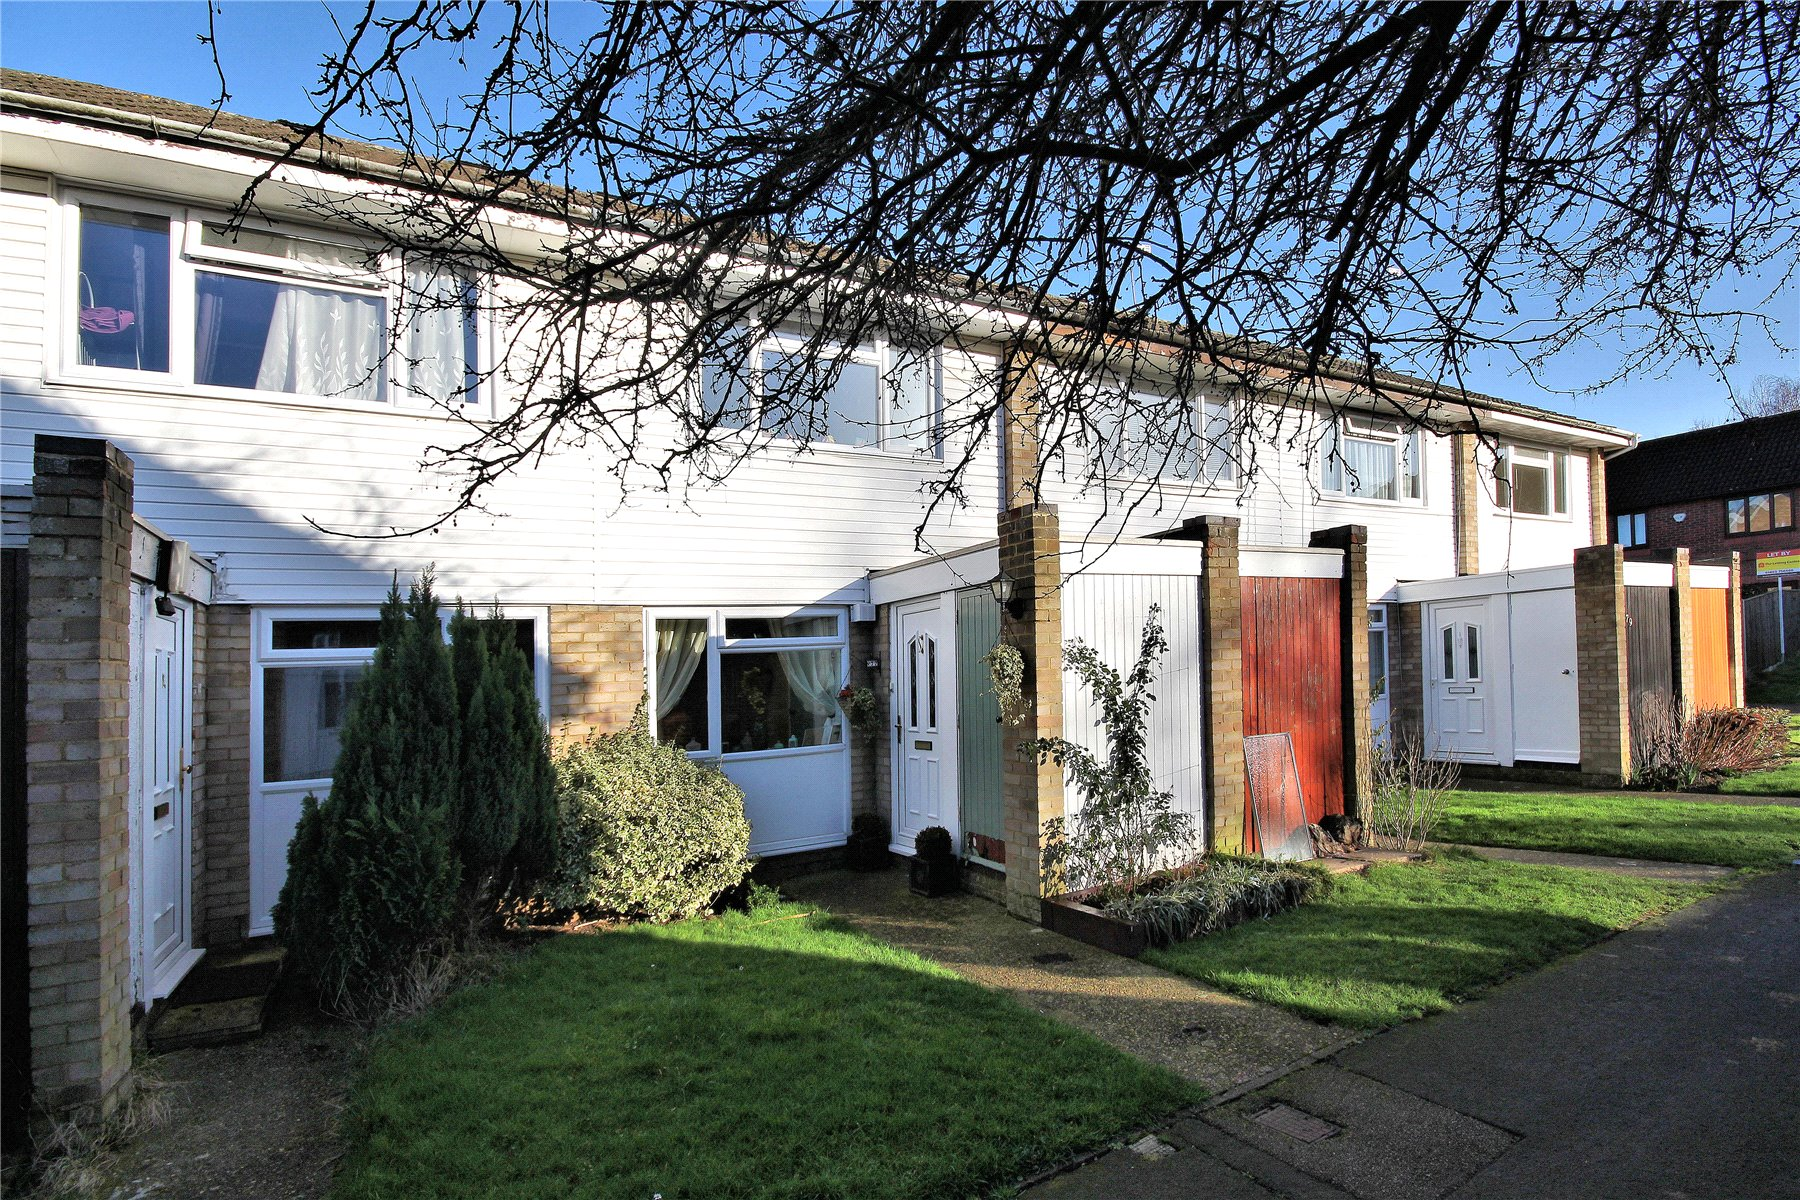 2 Bedrooms Terraced House for sale in Oakfield, Woking, Surrey, GU21